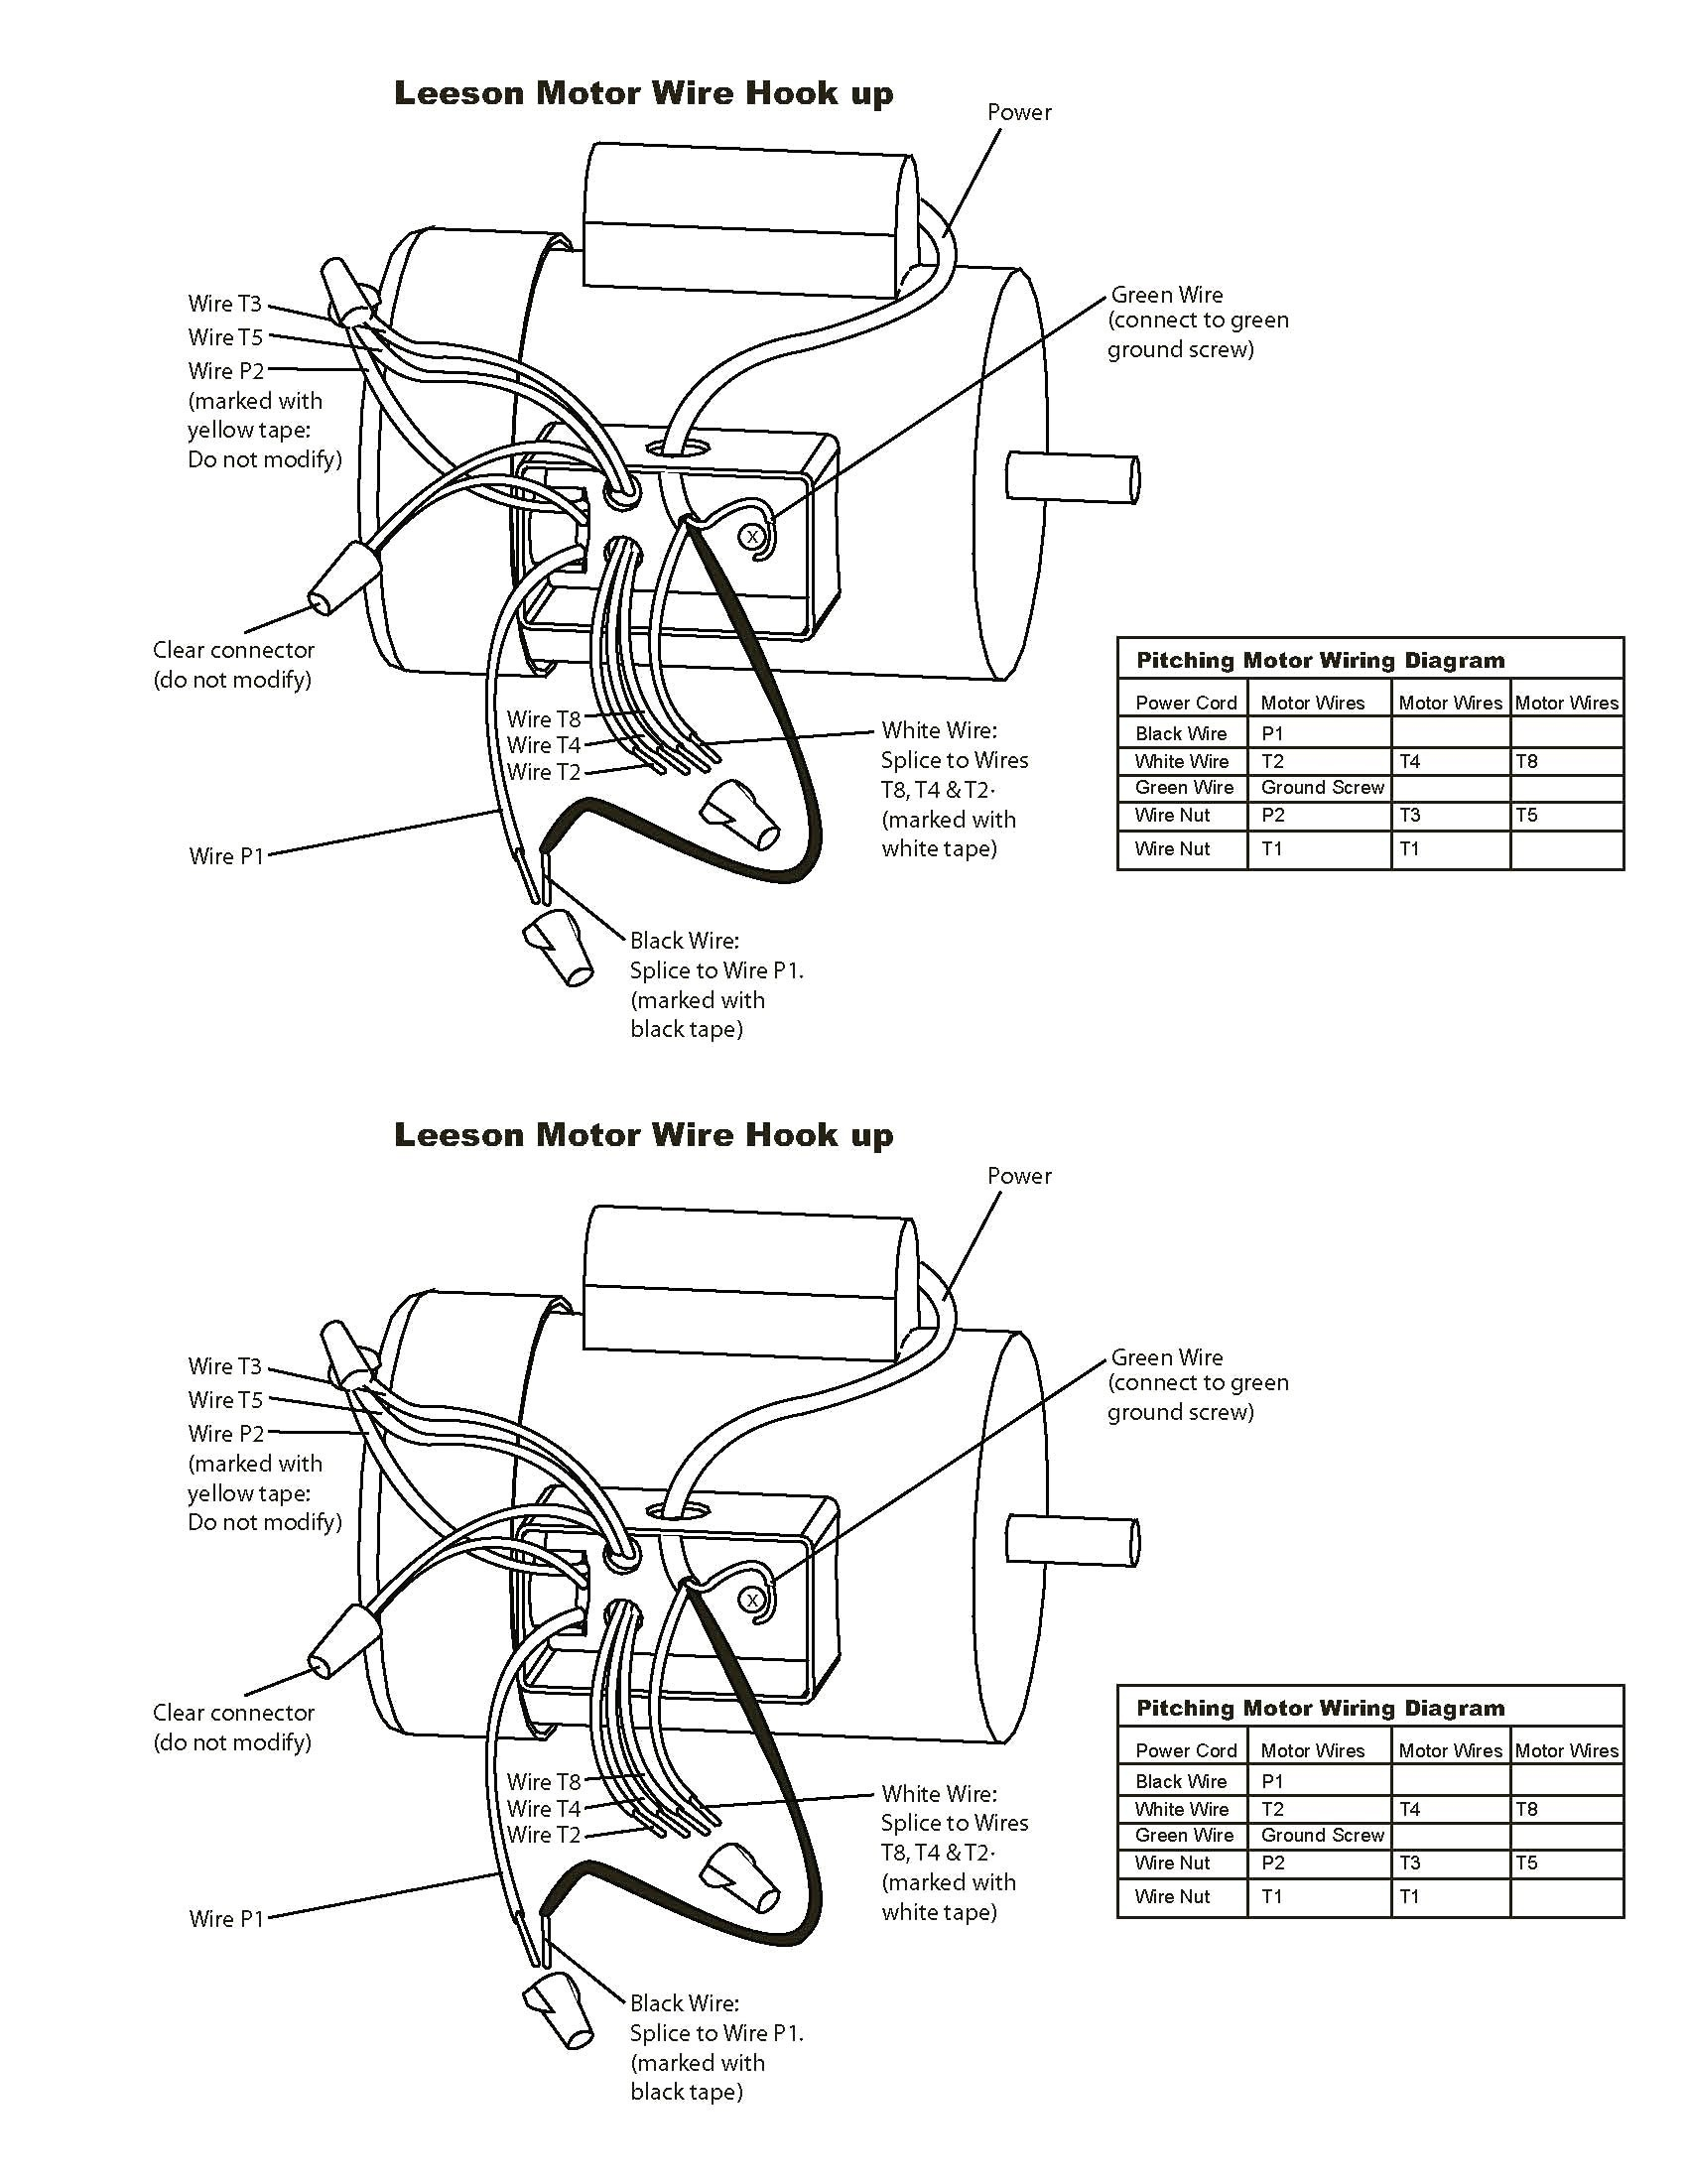 marathon boat lift motor wiring diagram Collection-Wiring Diagram for Boat Lift Motor Inspirationa Marathon Furnace Wiring Diagram Wire Center • 10-o